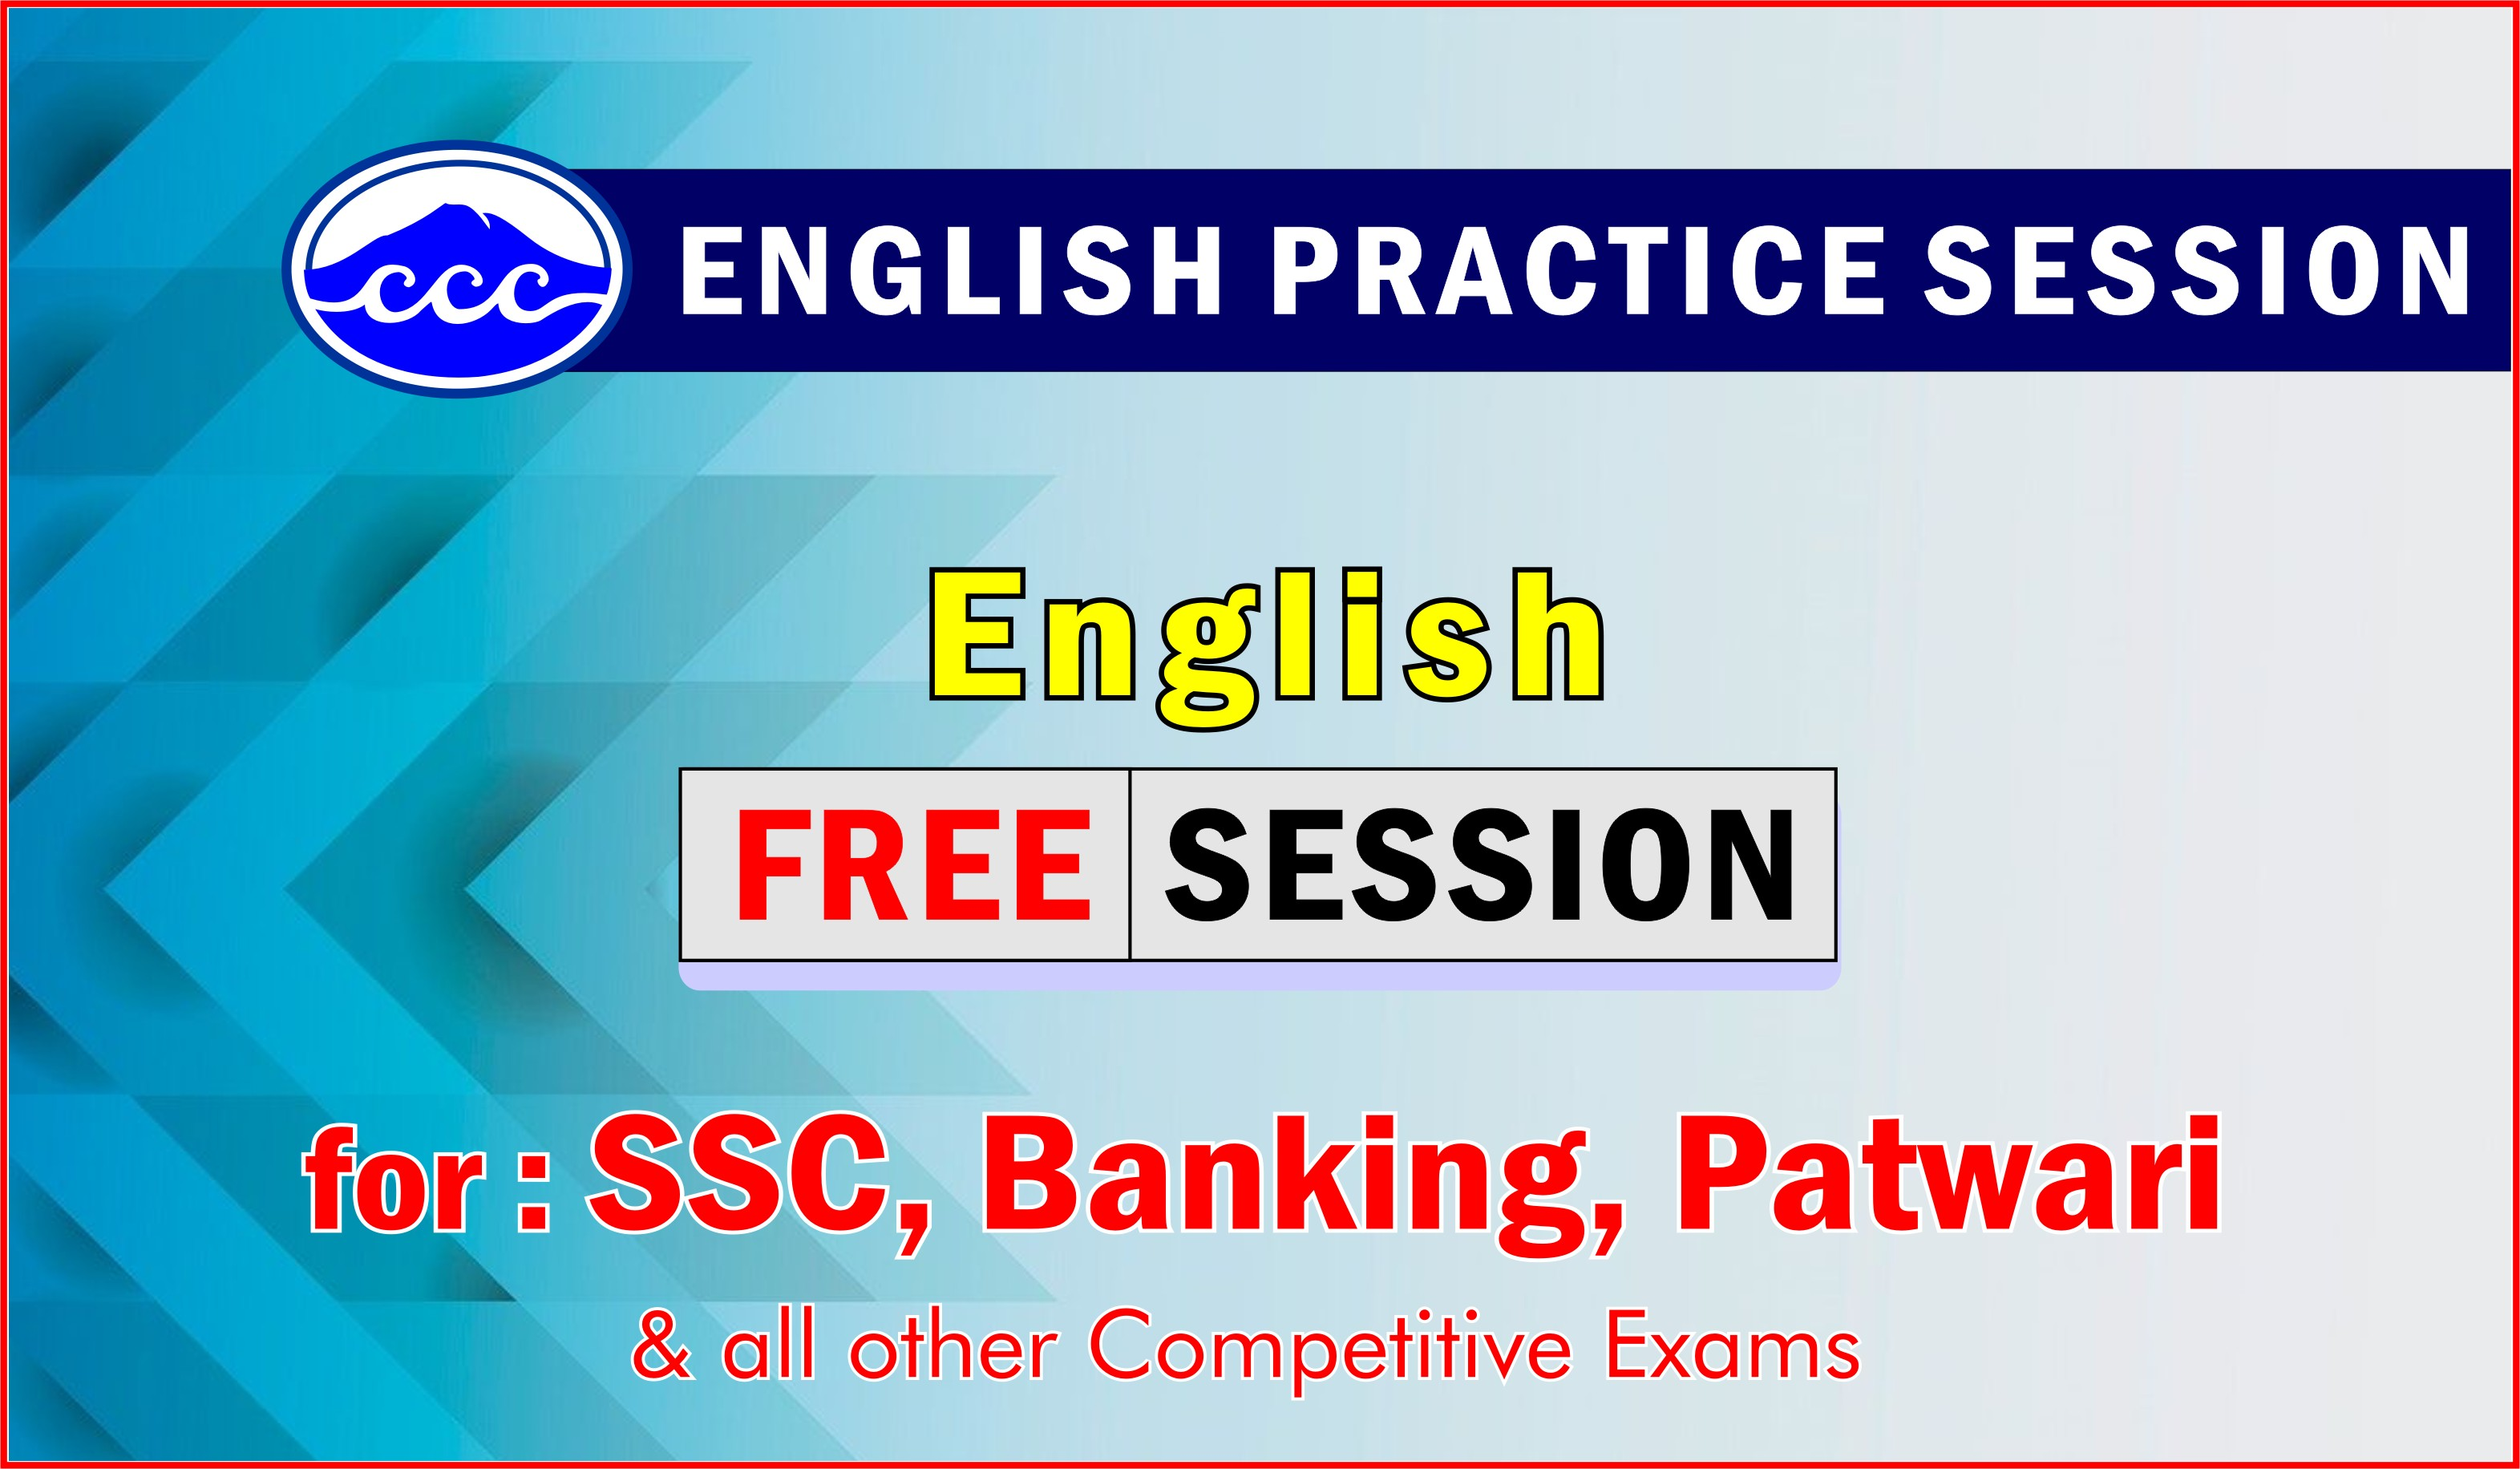 English Practice Session - 4